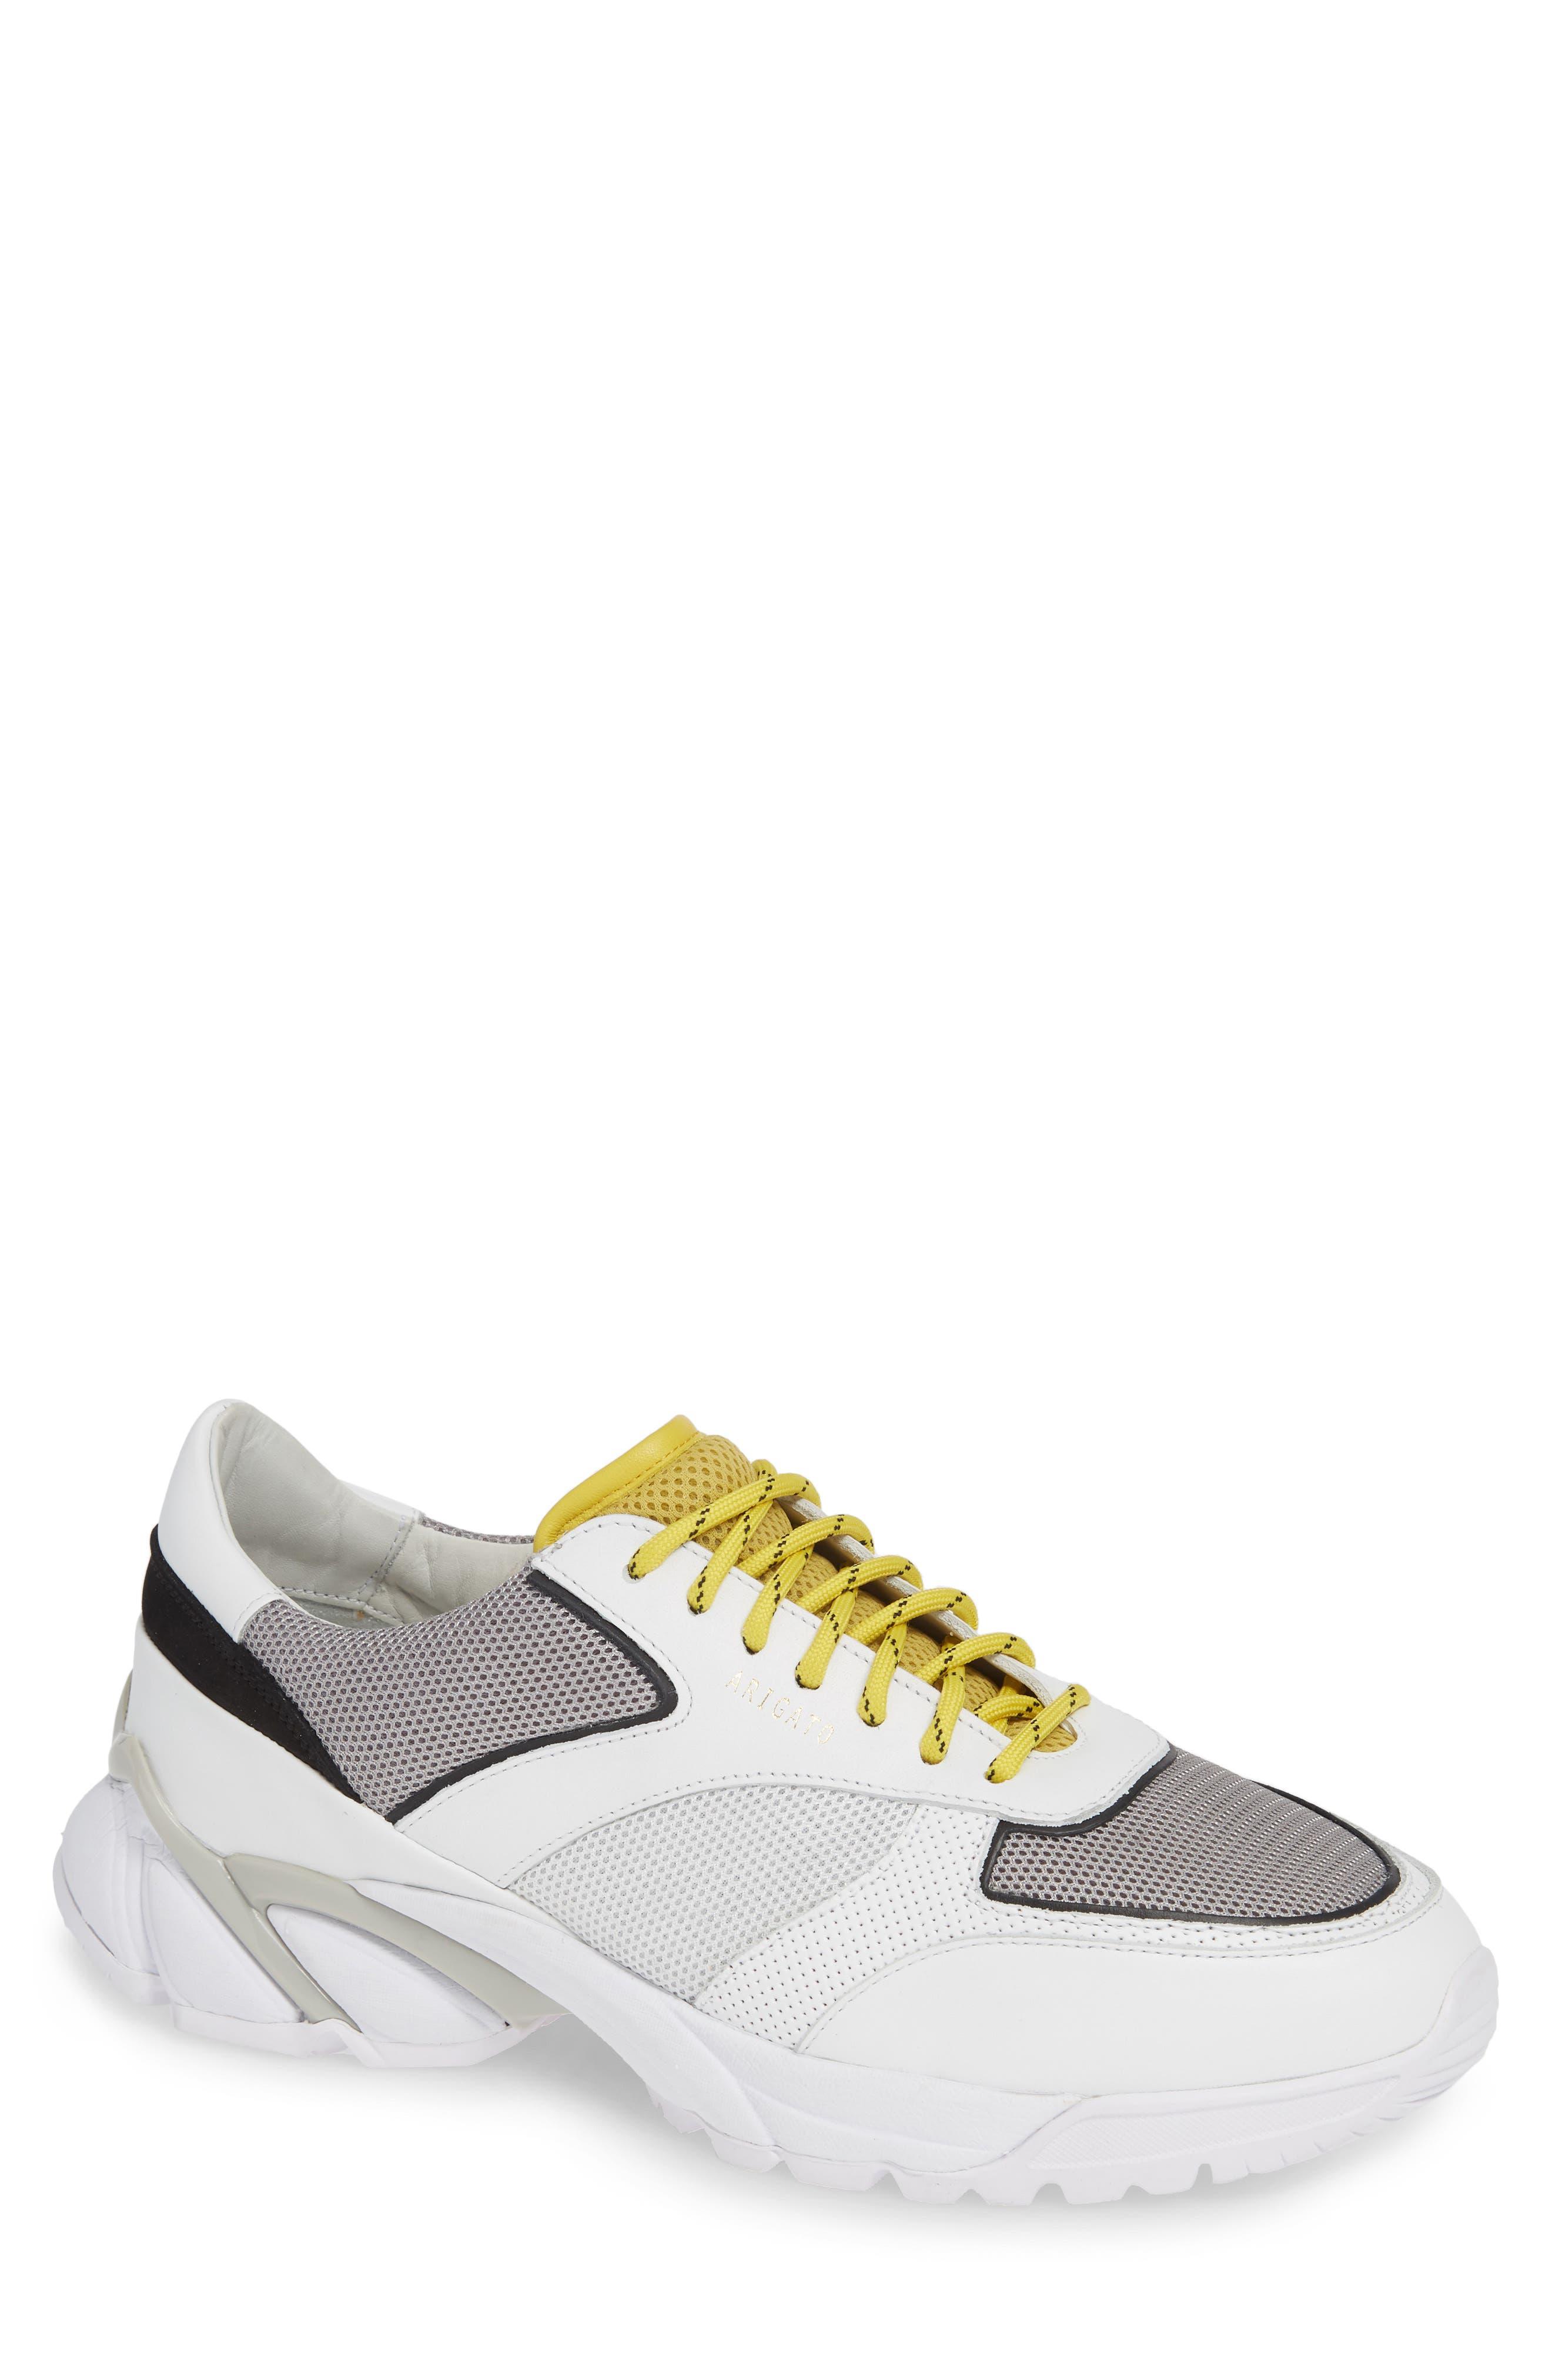 Tech Sneaker,                             Main thumbnail 1, color,                             100